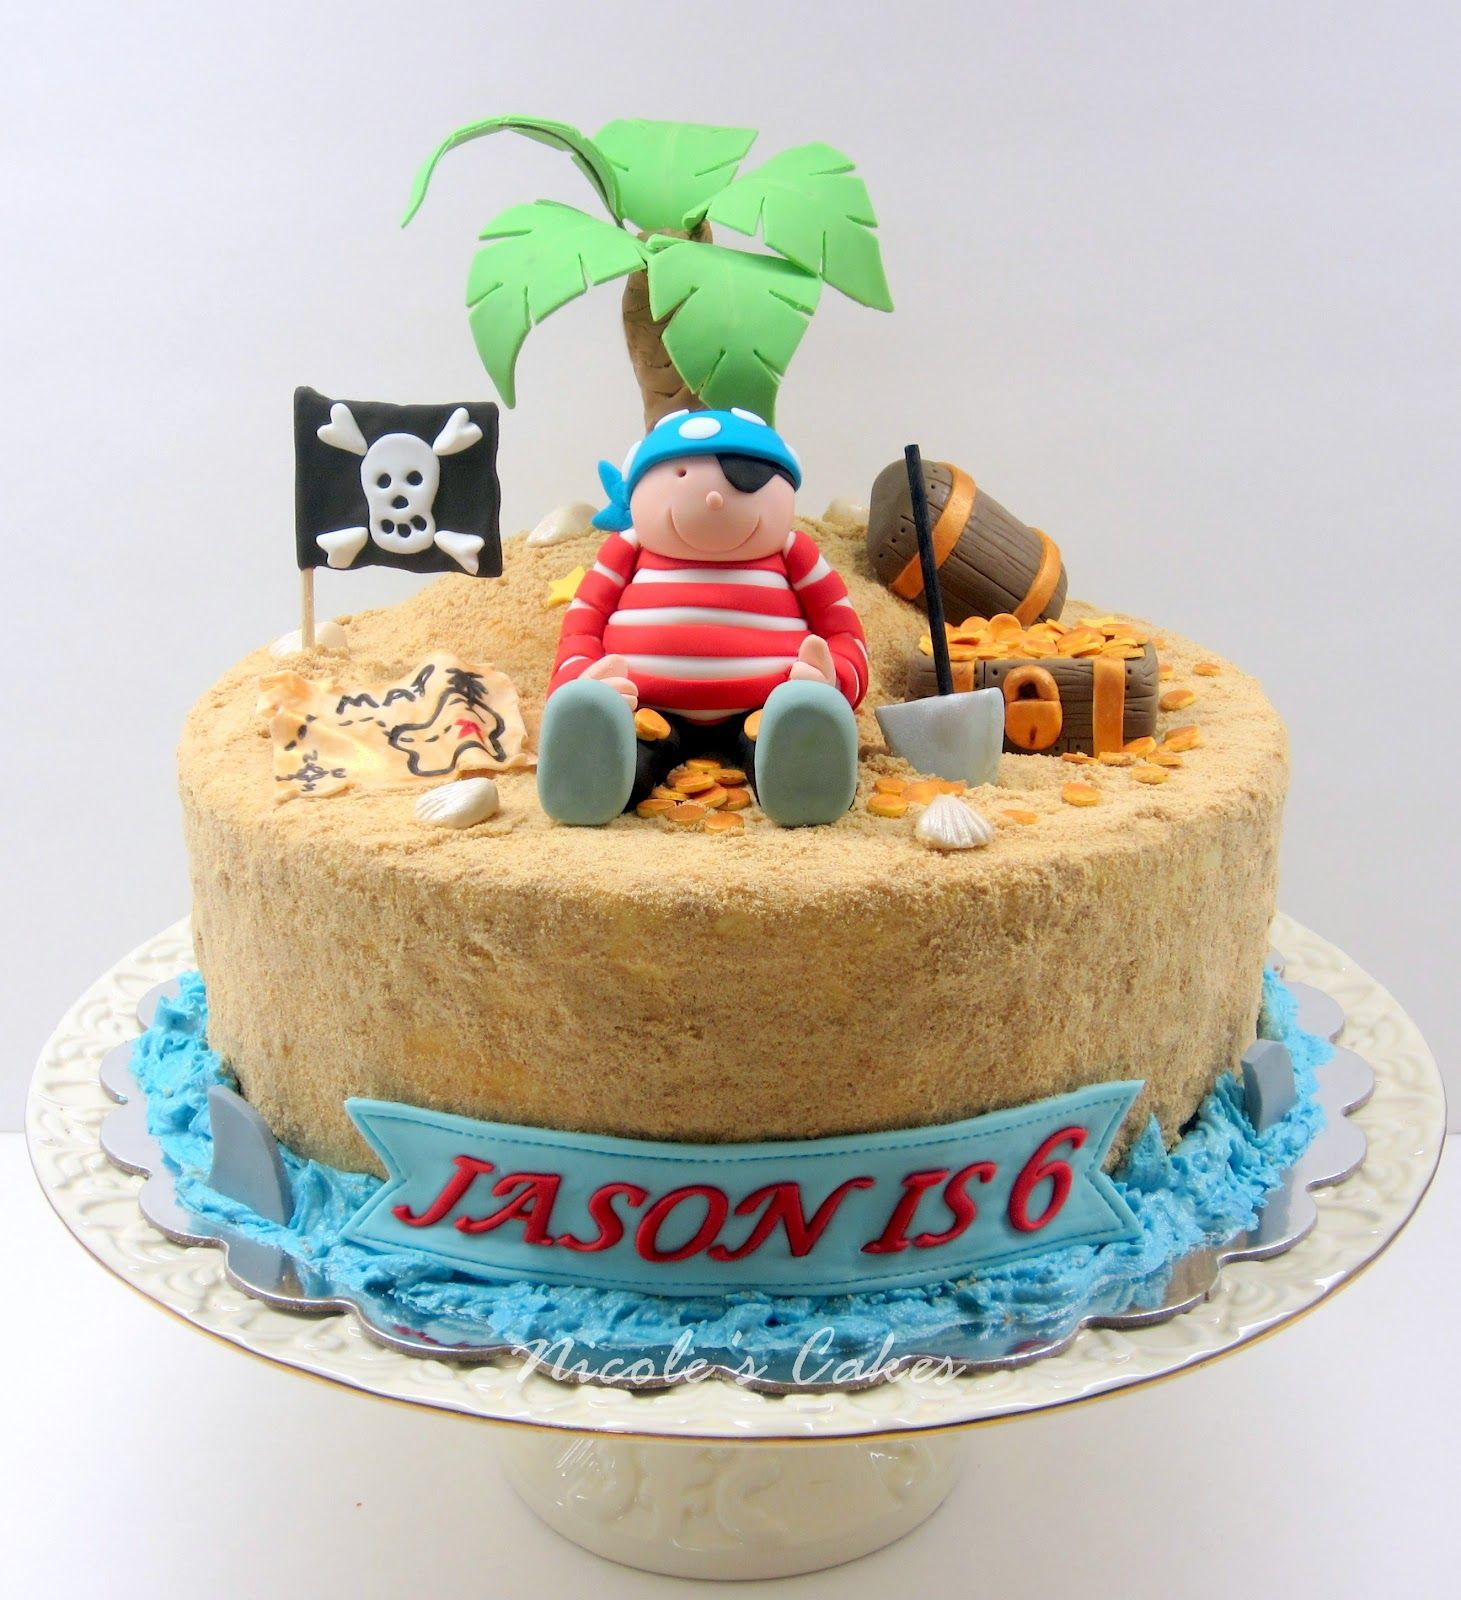 Cake ideas on pinterest pirate cakes marshmallow fondant and - Cake